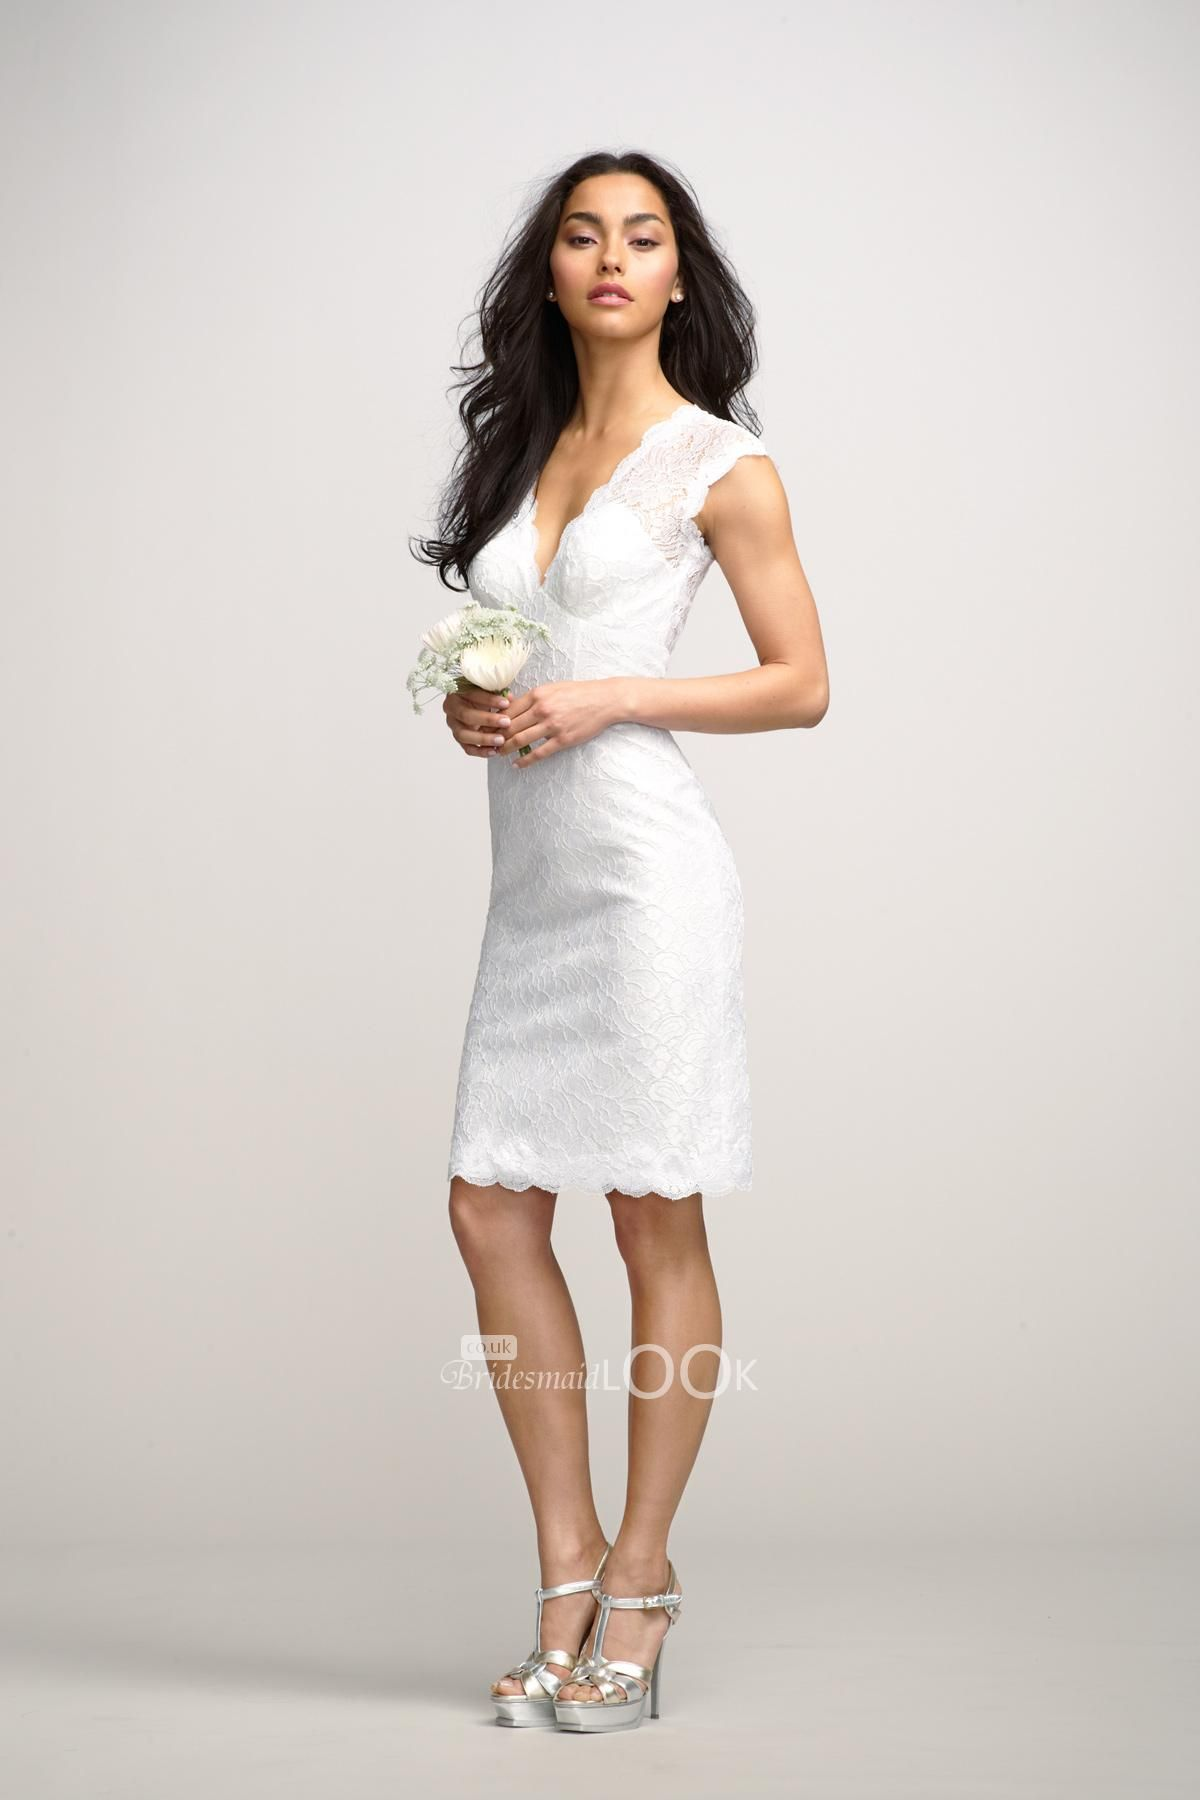 Short white dresses little white vneck lace short bridesmaid